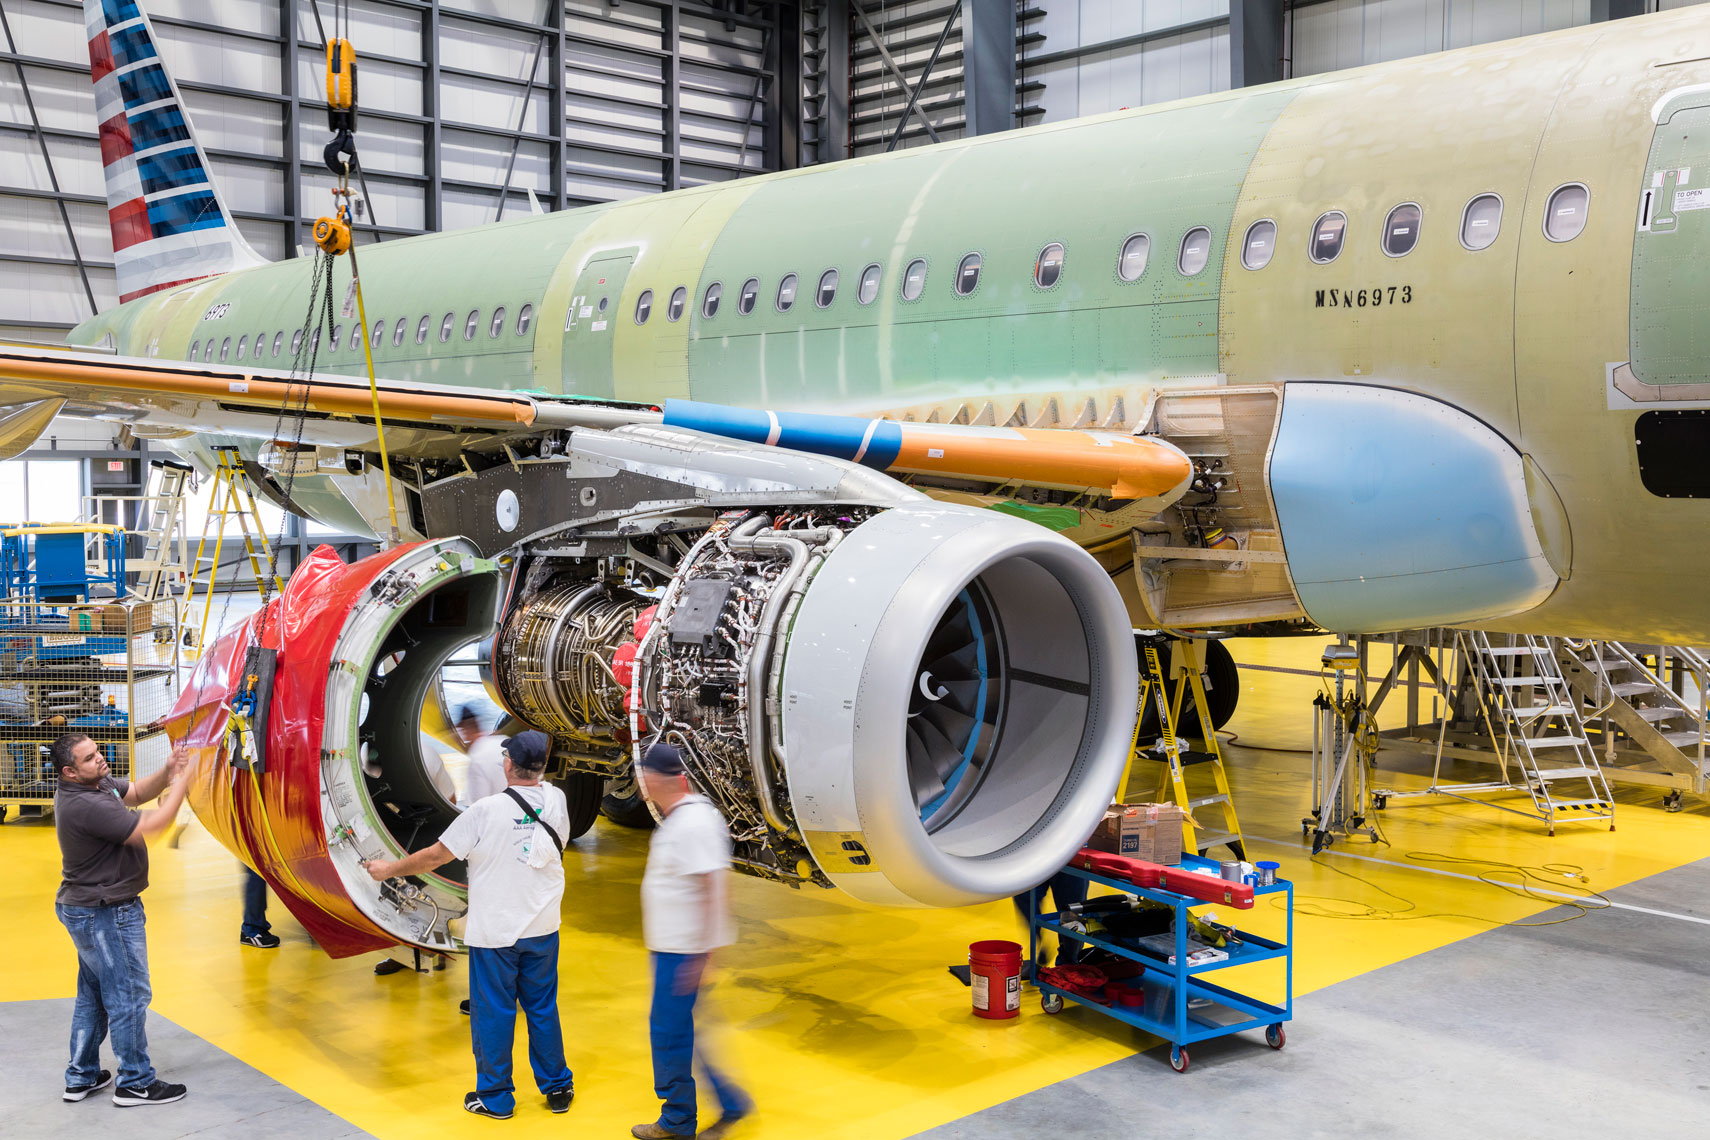 Payne_Airbus_0262.jpg